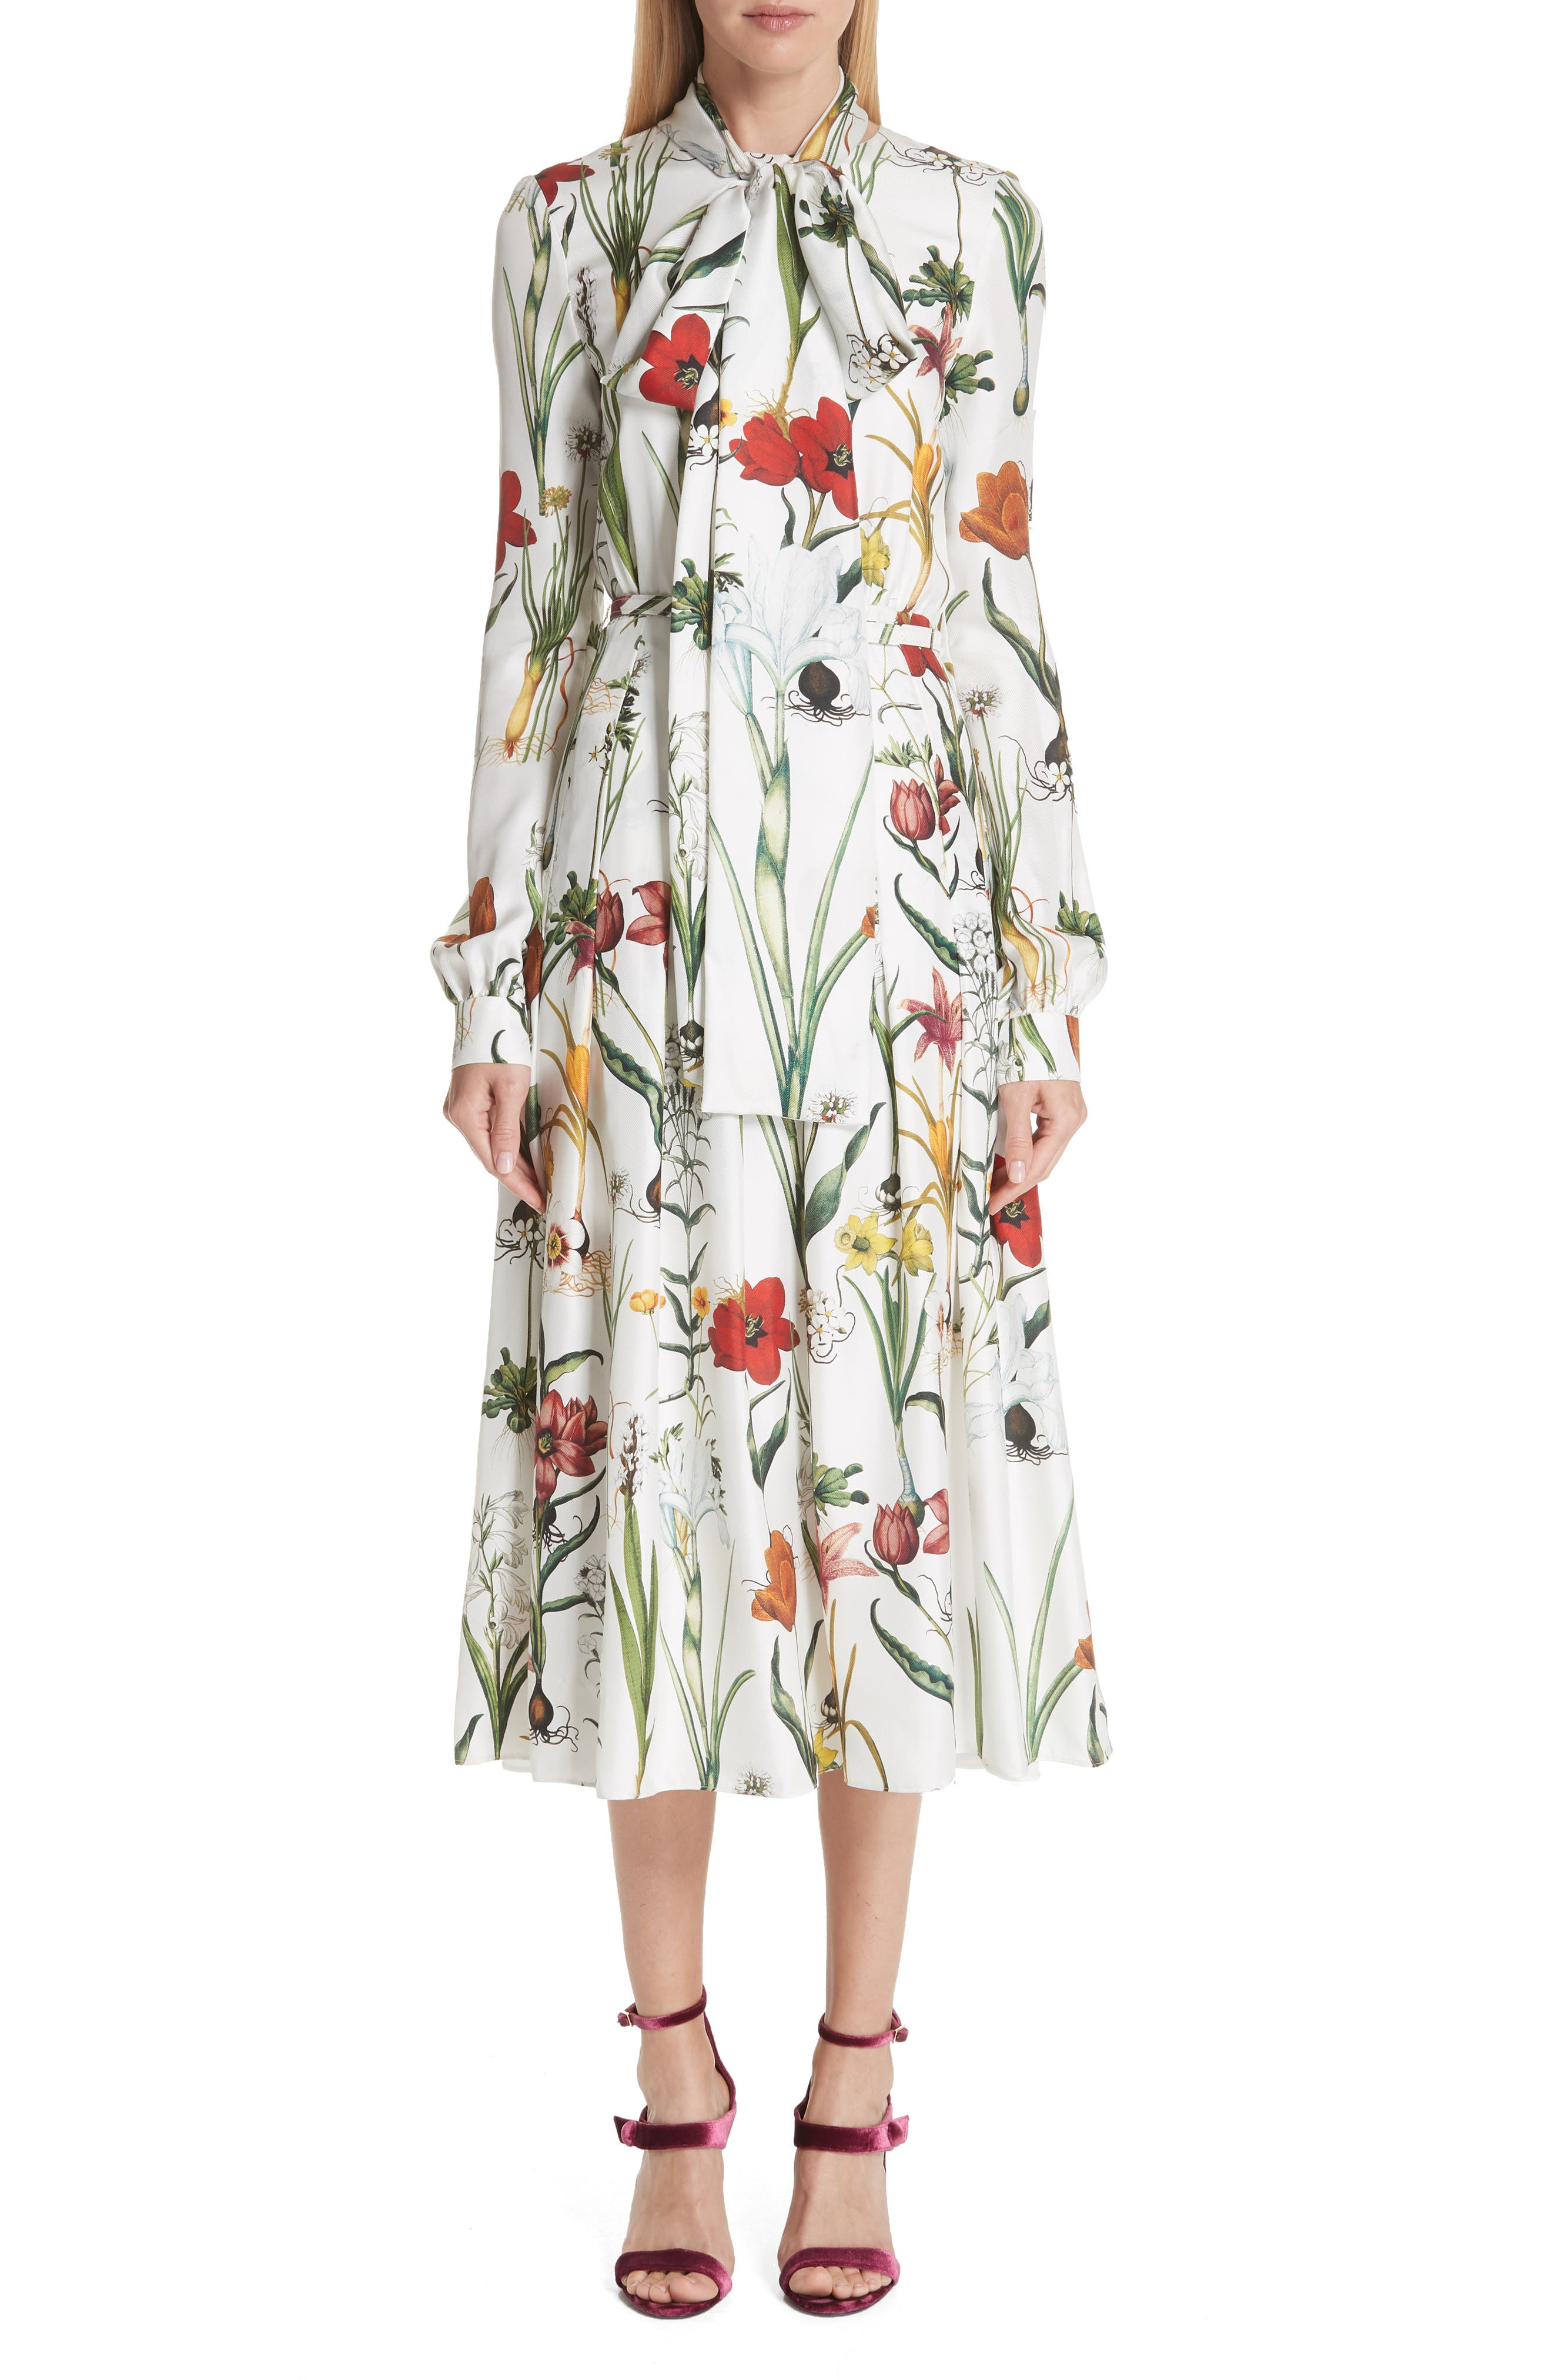 Oscar De La Renta Harvest Floral Silk Twill Dress, White